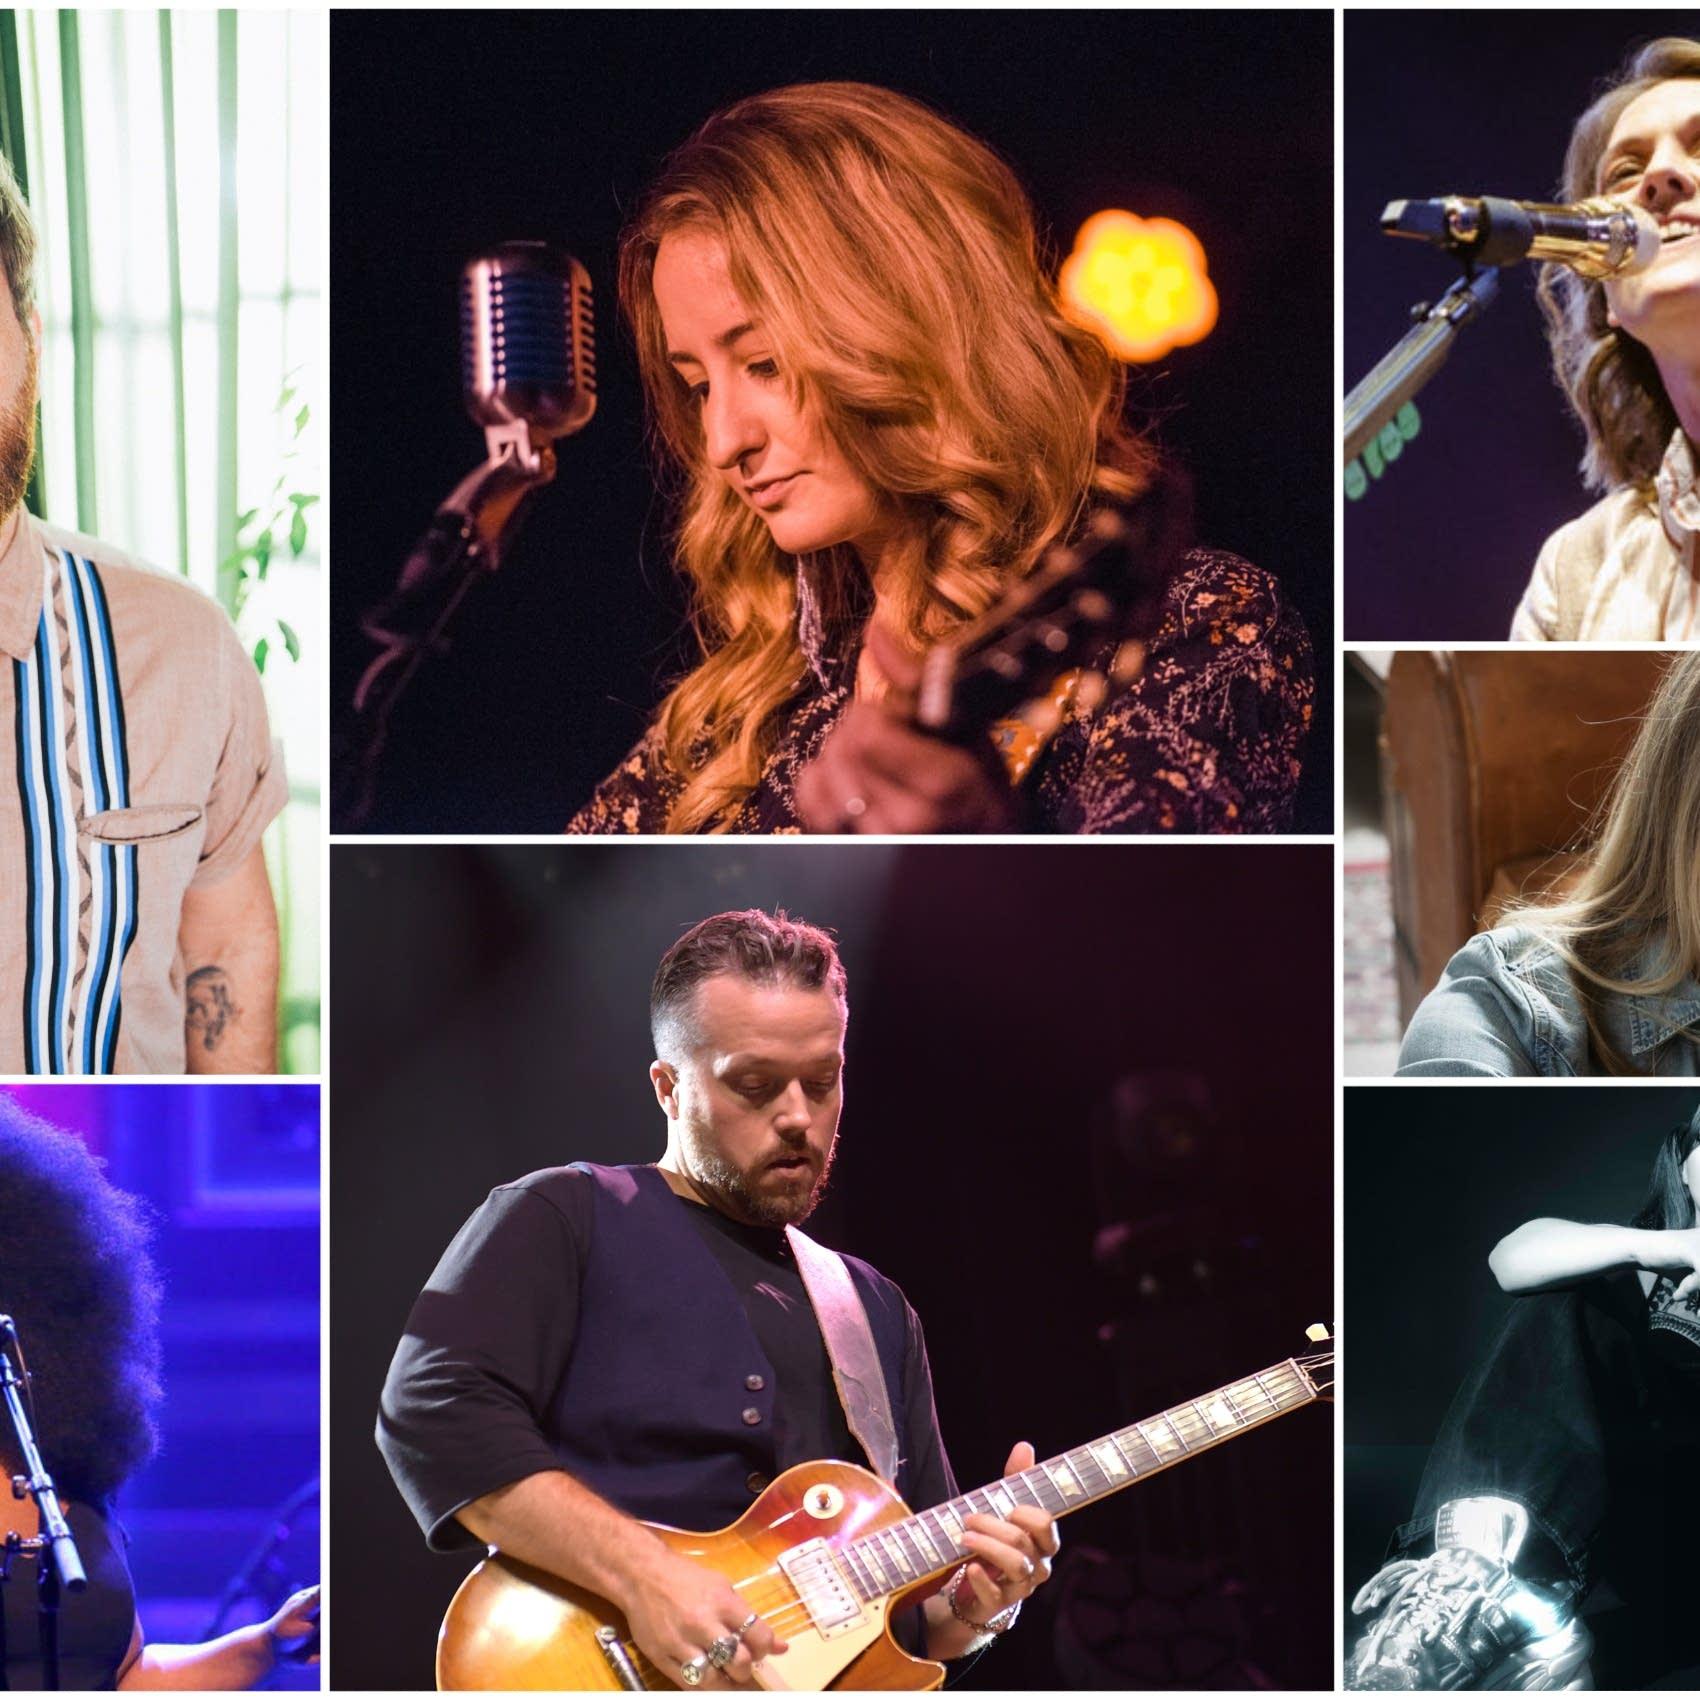 Nashville benefit concert artist collage